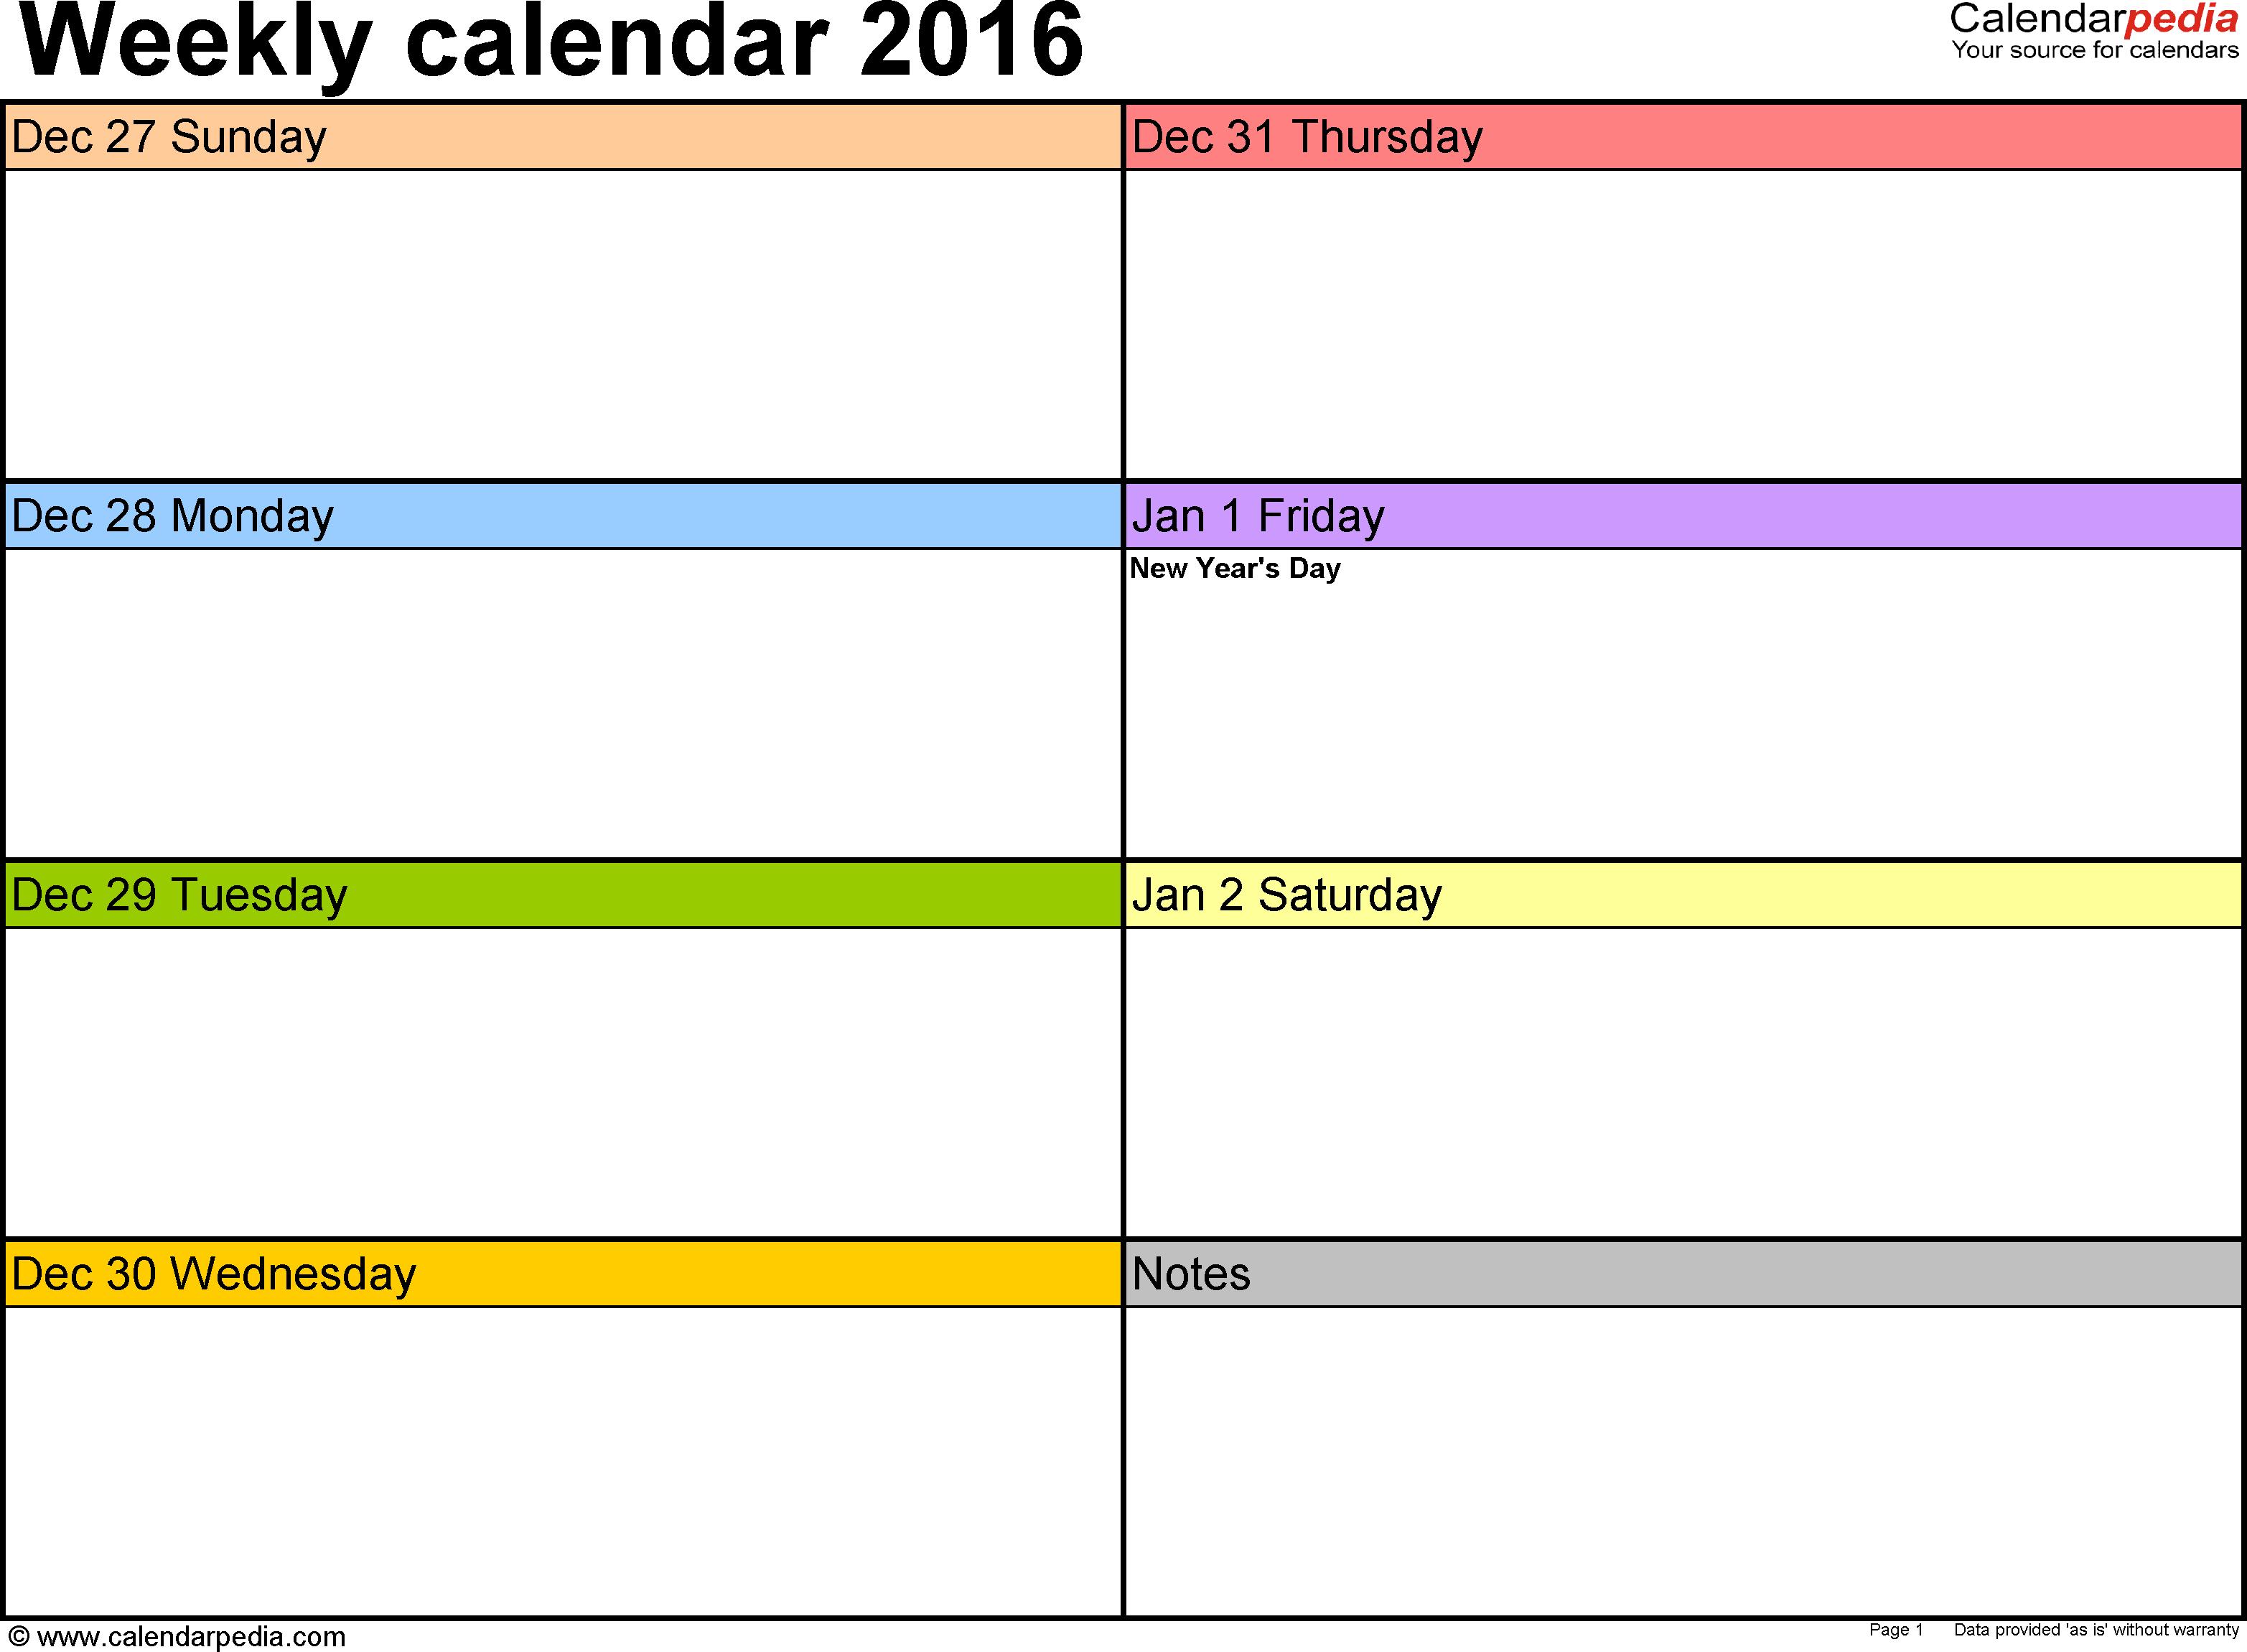 Weekly Calendar 2016: Template For Pdf Version 6, Landscape 2 Week Schedule Word Template